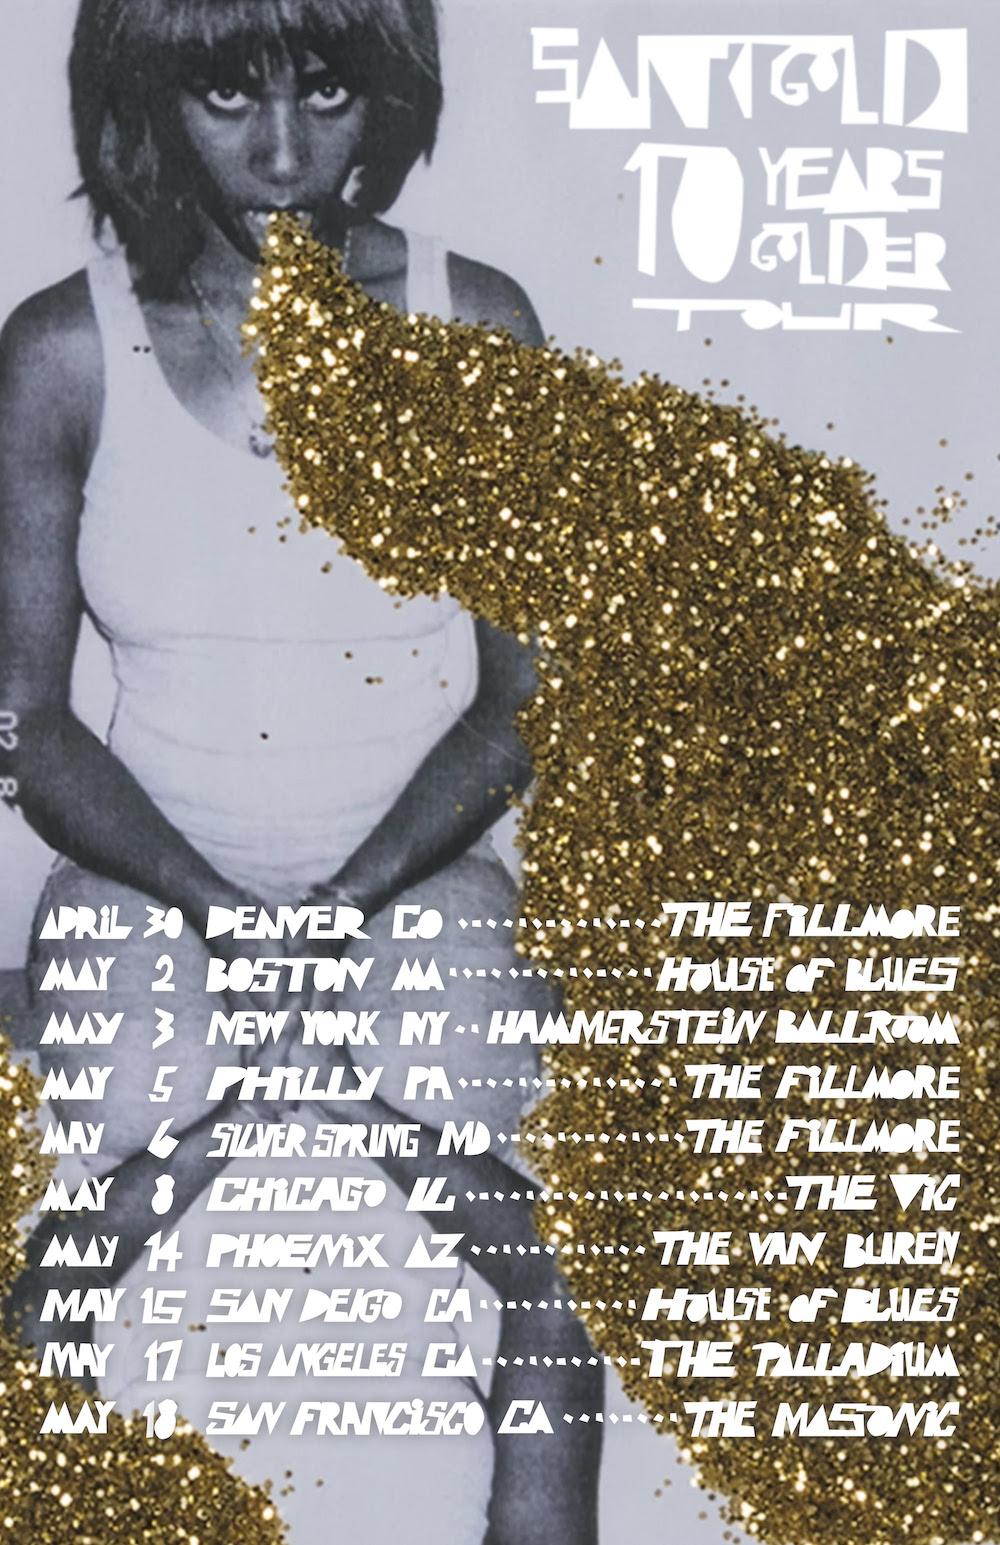 Santigold 10 years golder tour dates